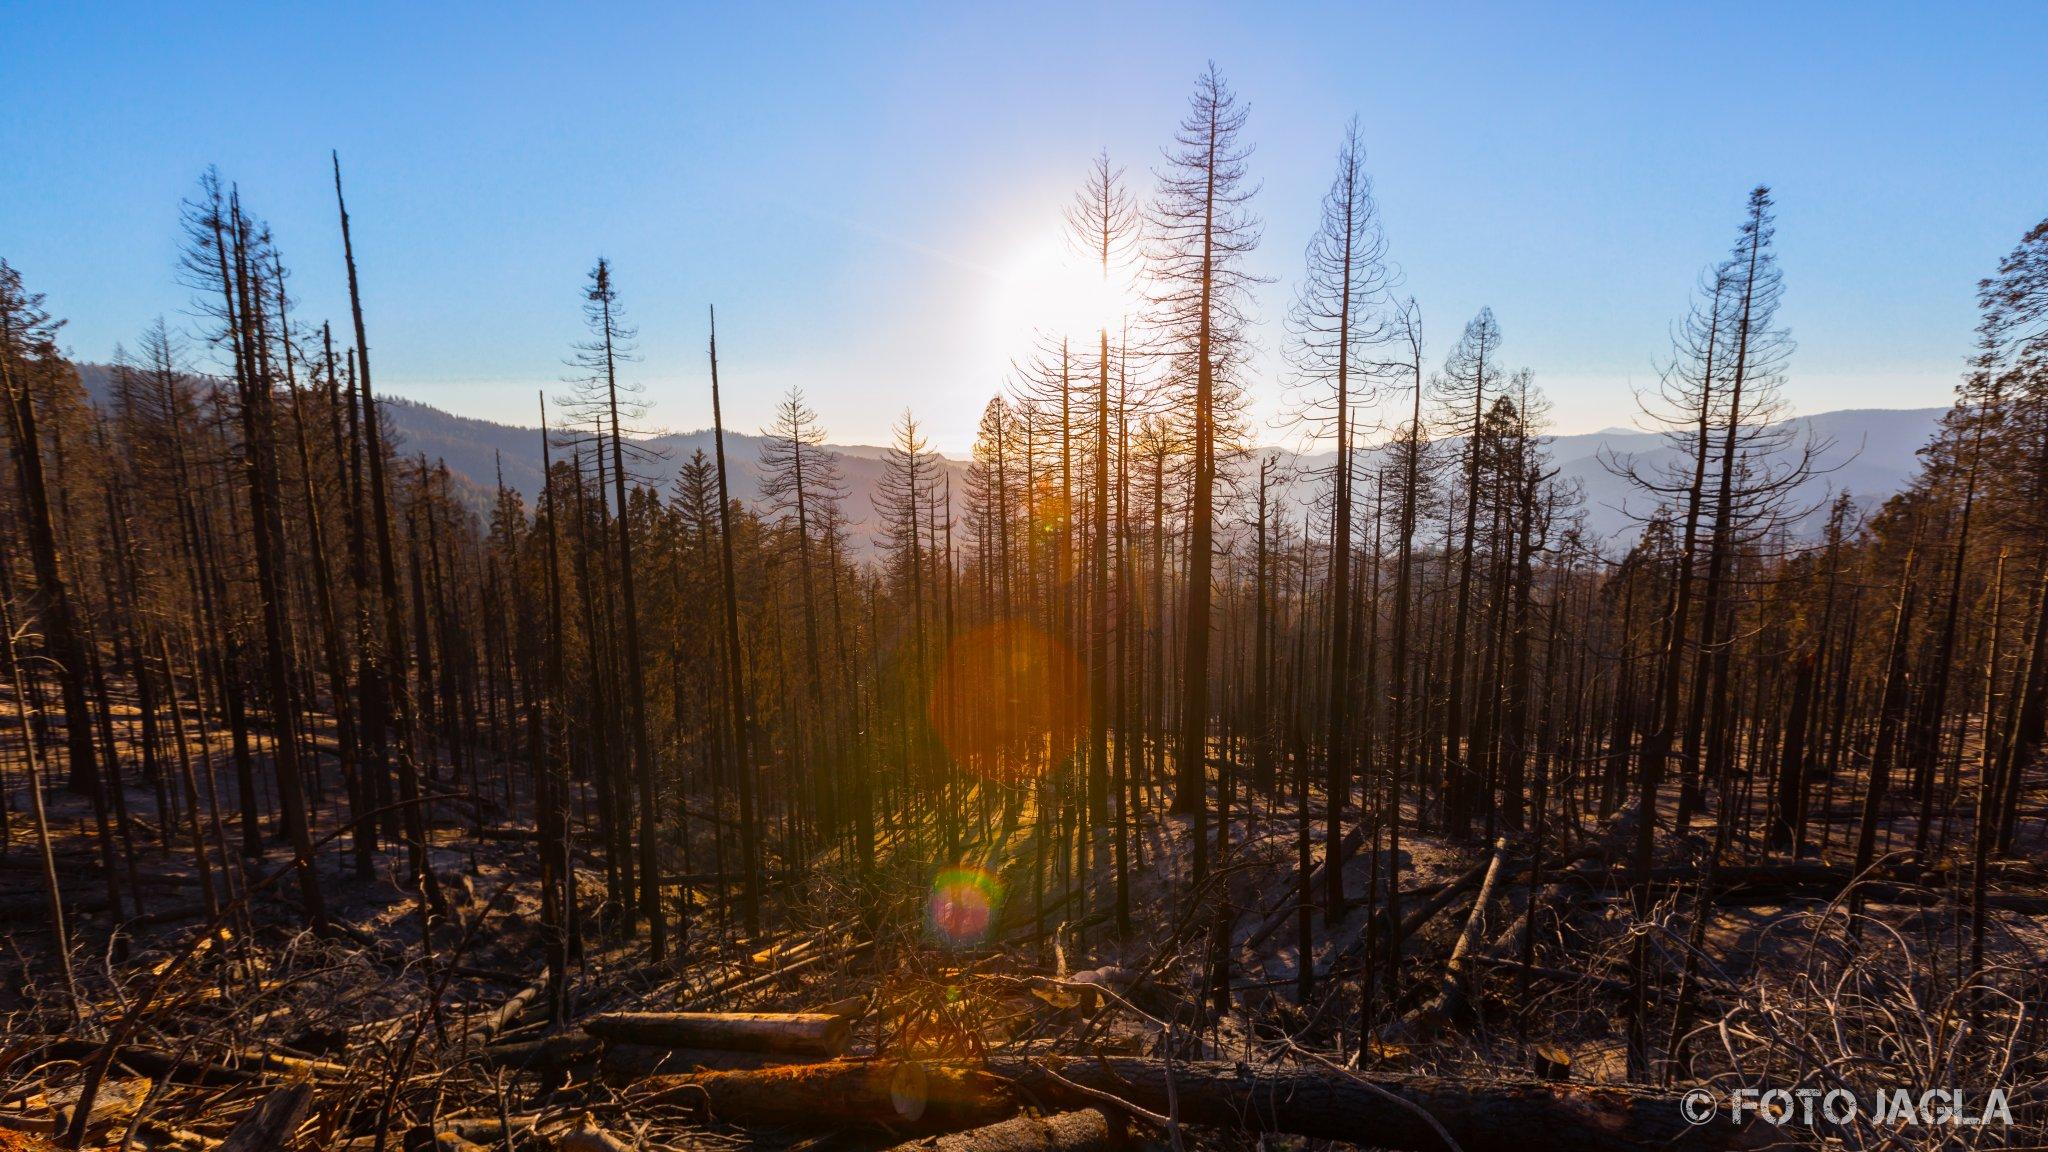 Kalifornien - September 2018 Verbrannter Wald an der Wawona Road Yosemite National Park - Wawona